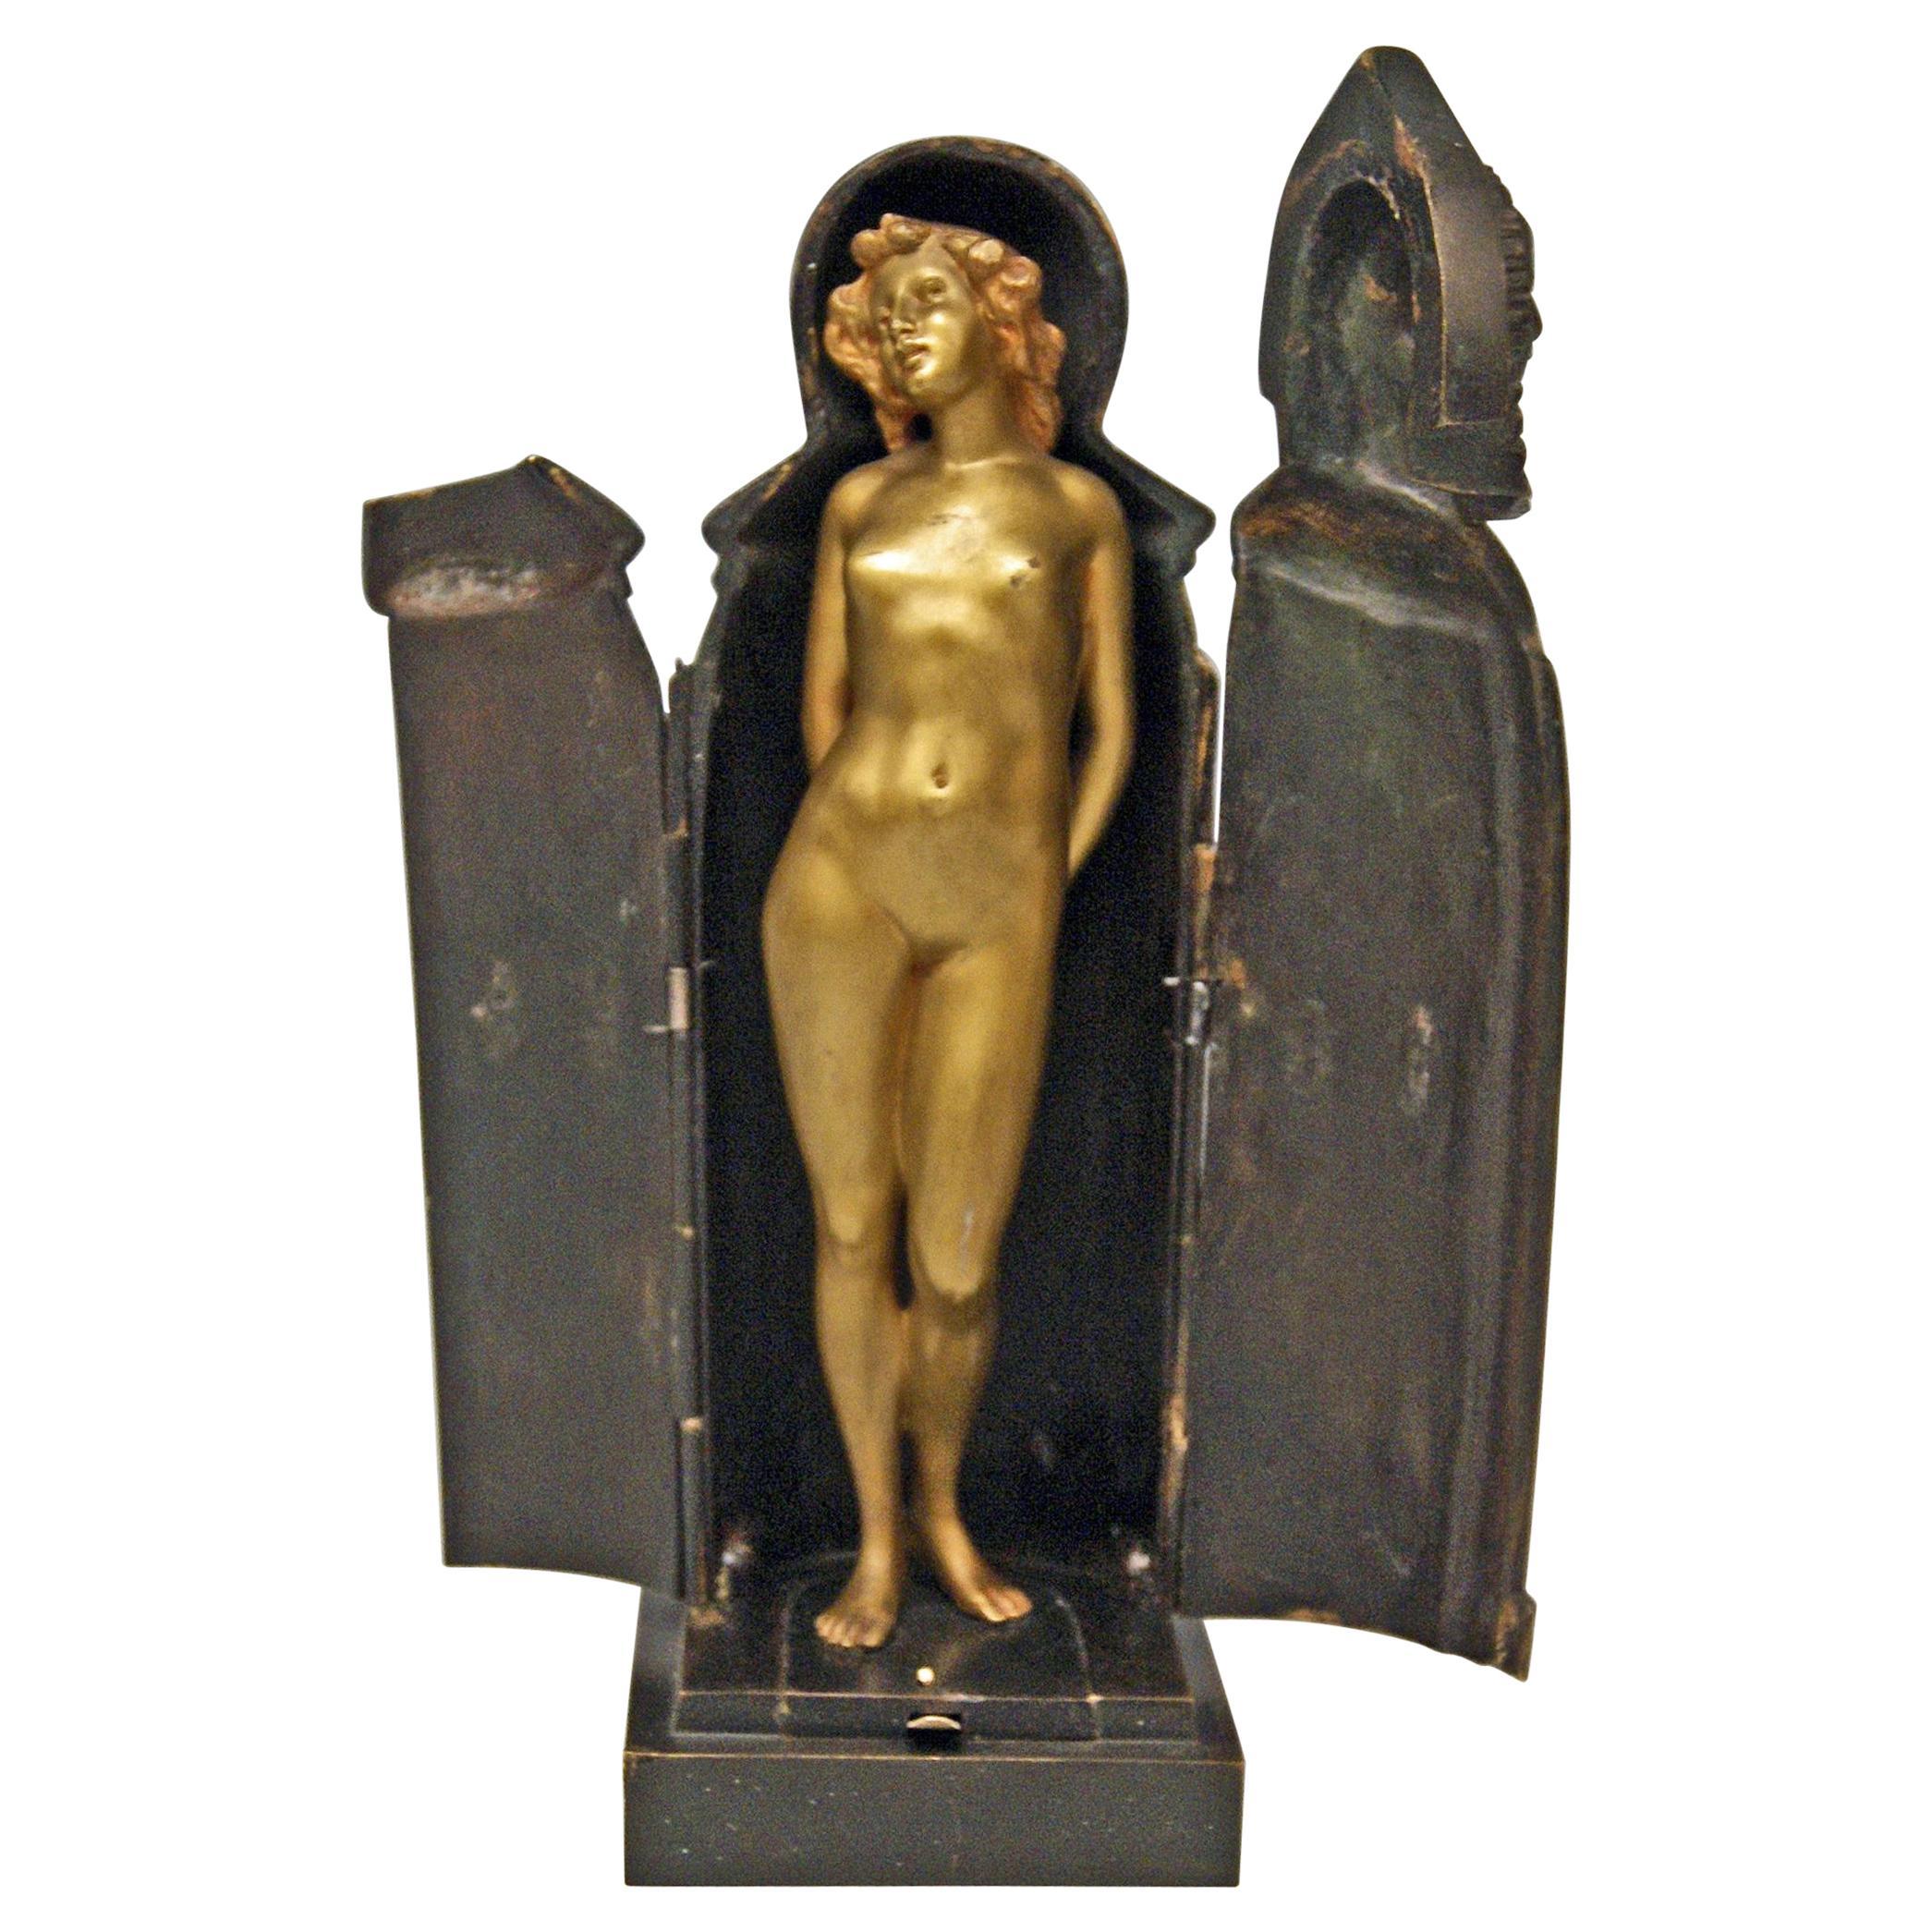 Vienna Bronze Lady Nude in Sarcophagus by Carl Kauba Vintage Made, circa 1900